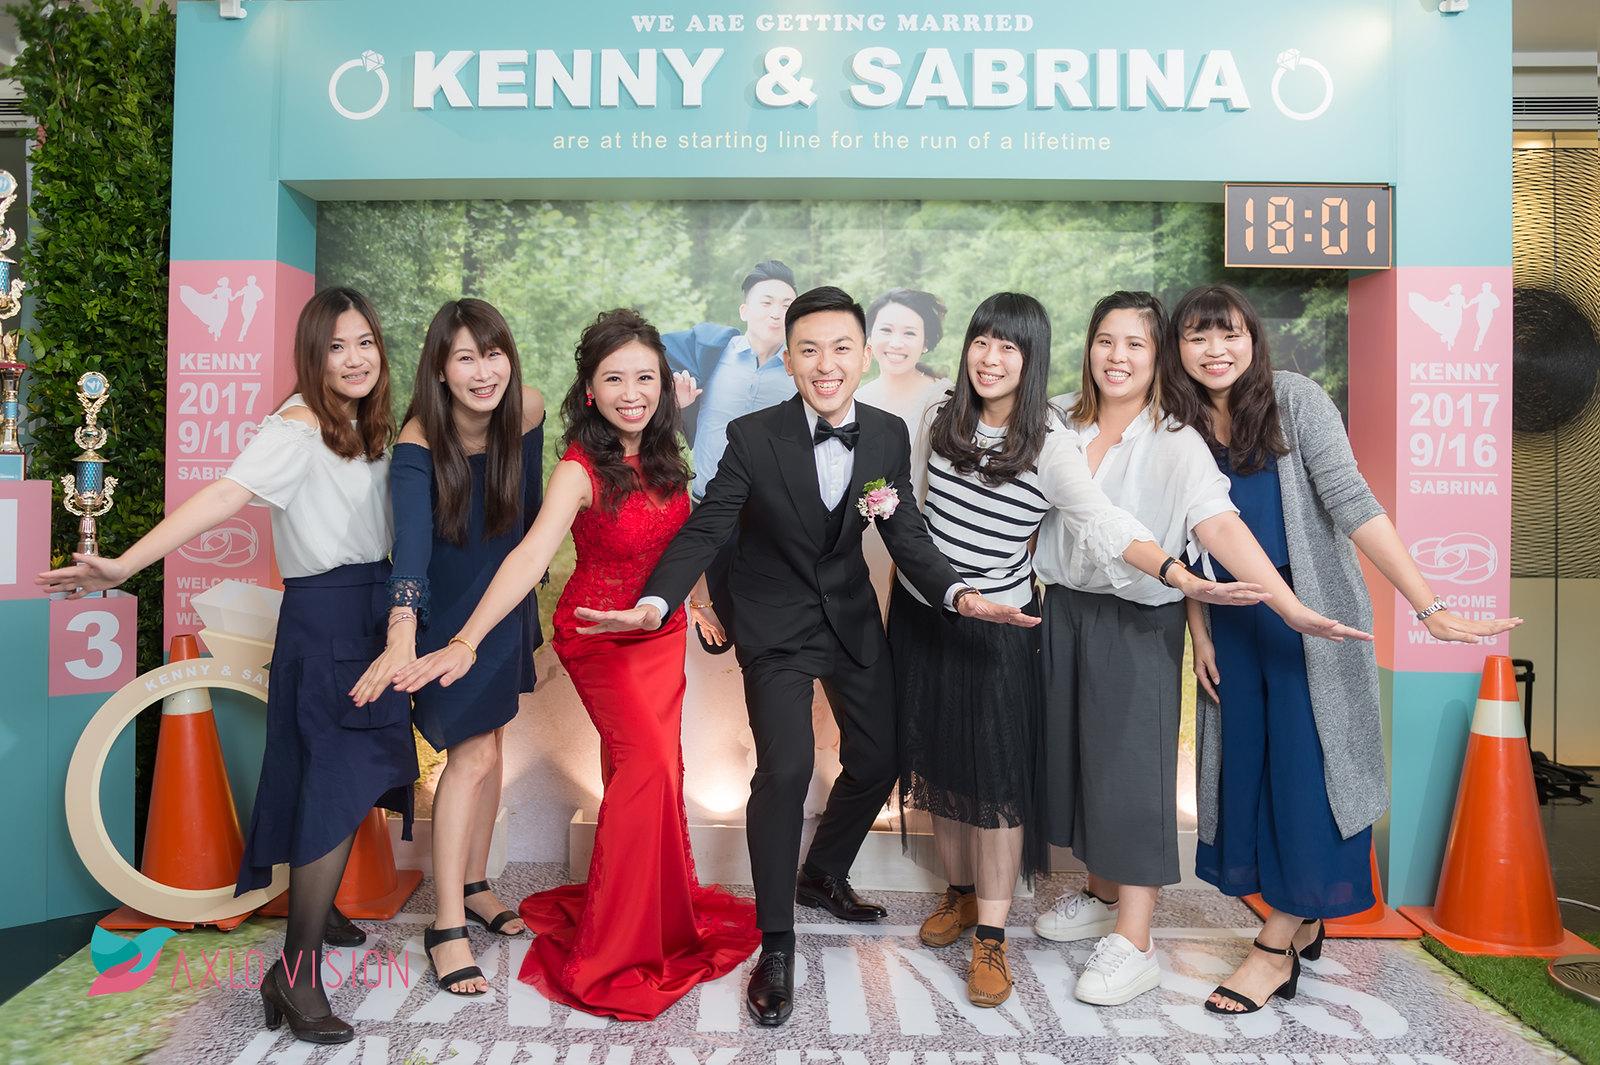 20170916 WeddingDay_204